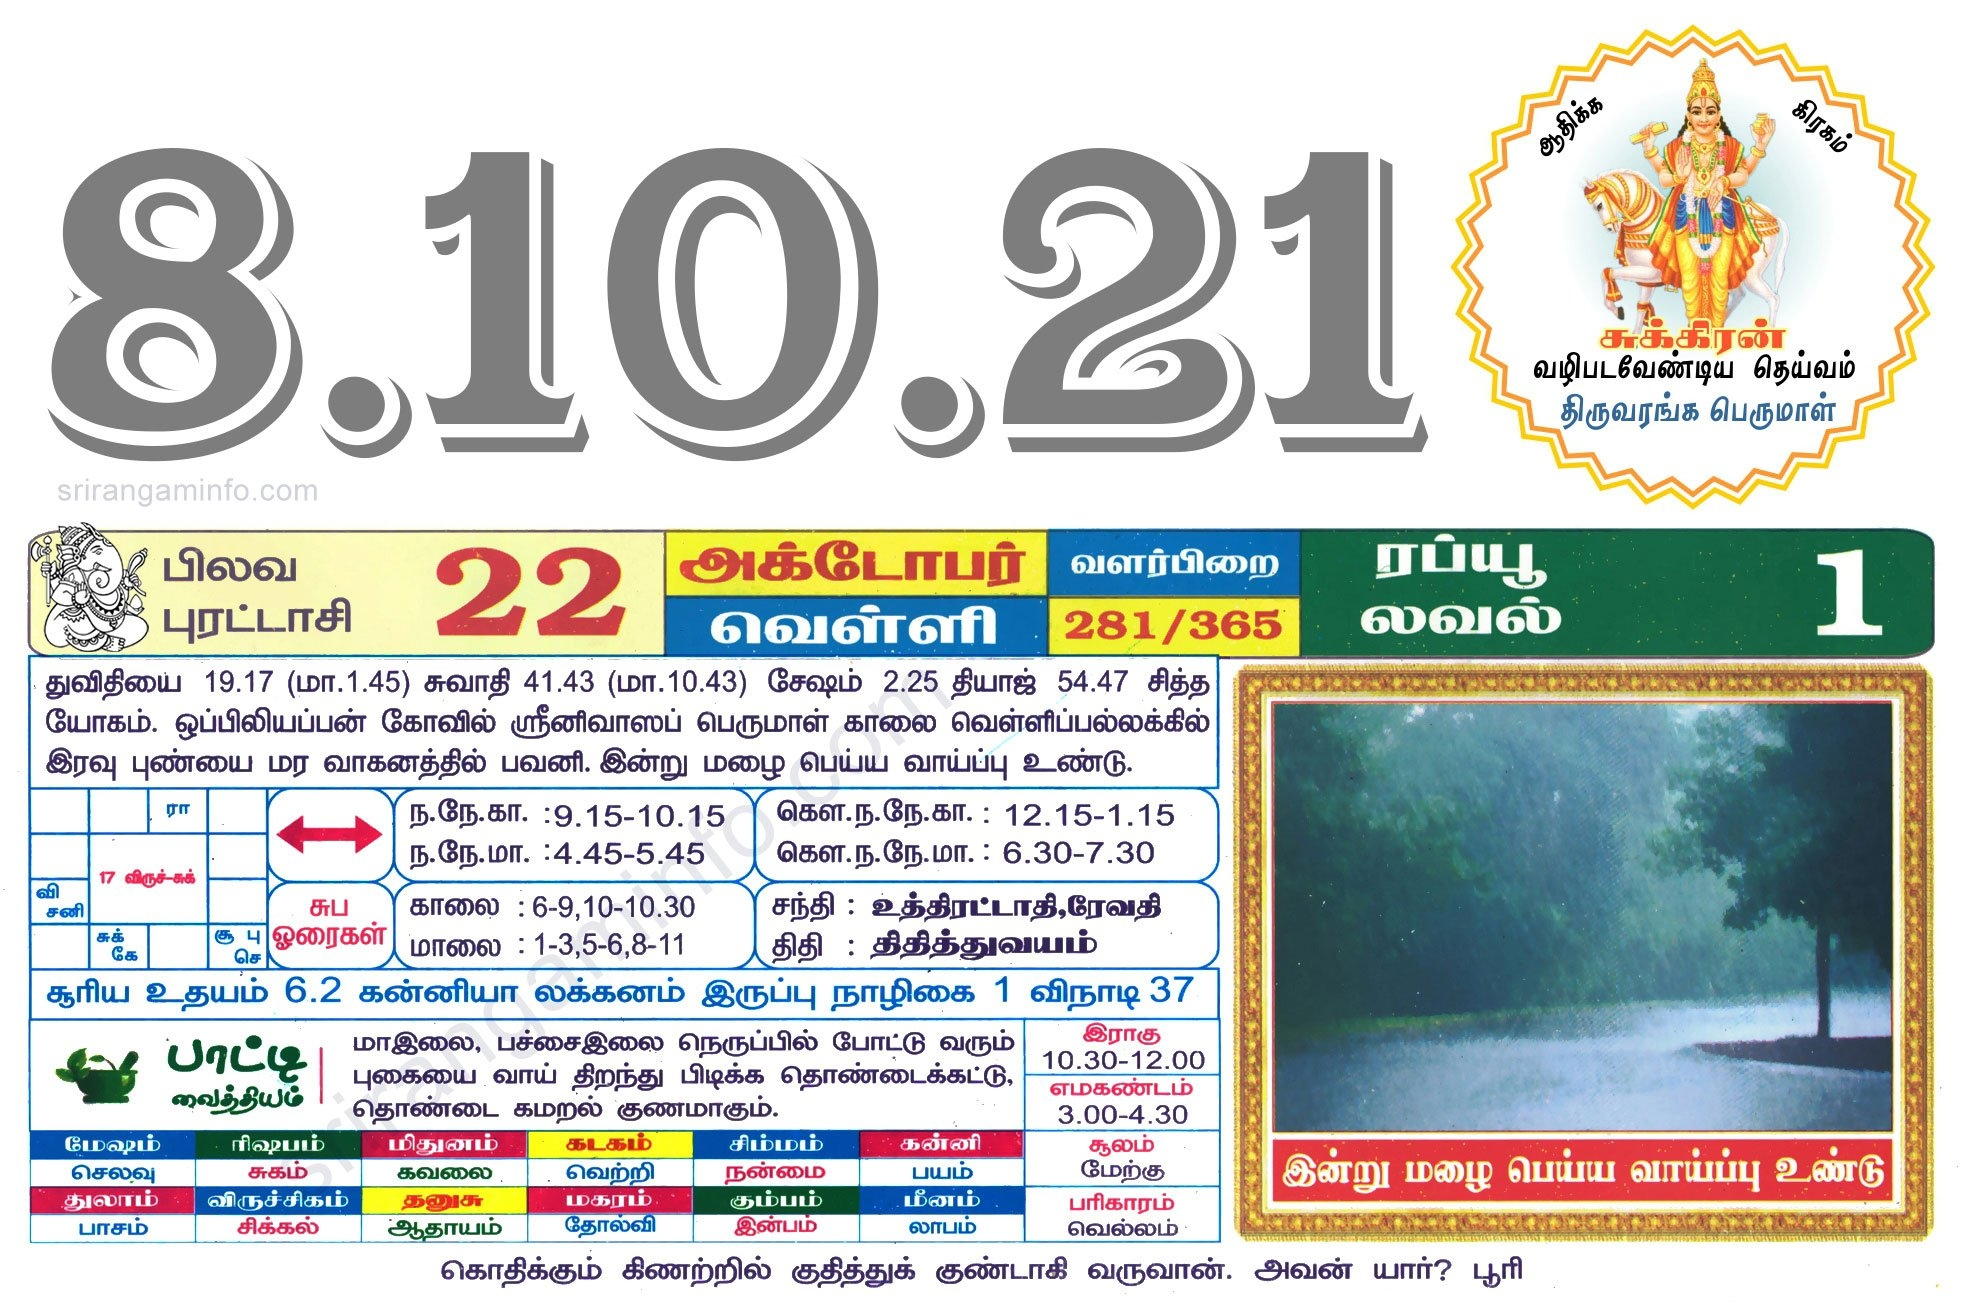 Tamil Daily Calendar 2021, Tamil Calendar 2021, Nalla Neram - தமிழ் தினசரி காலண்டர் inside 2021 2021 Tamil Calendar Photo